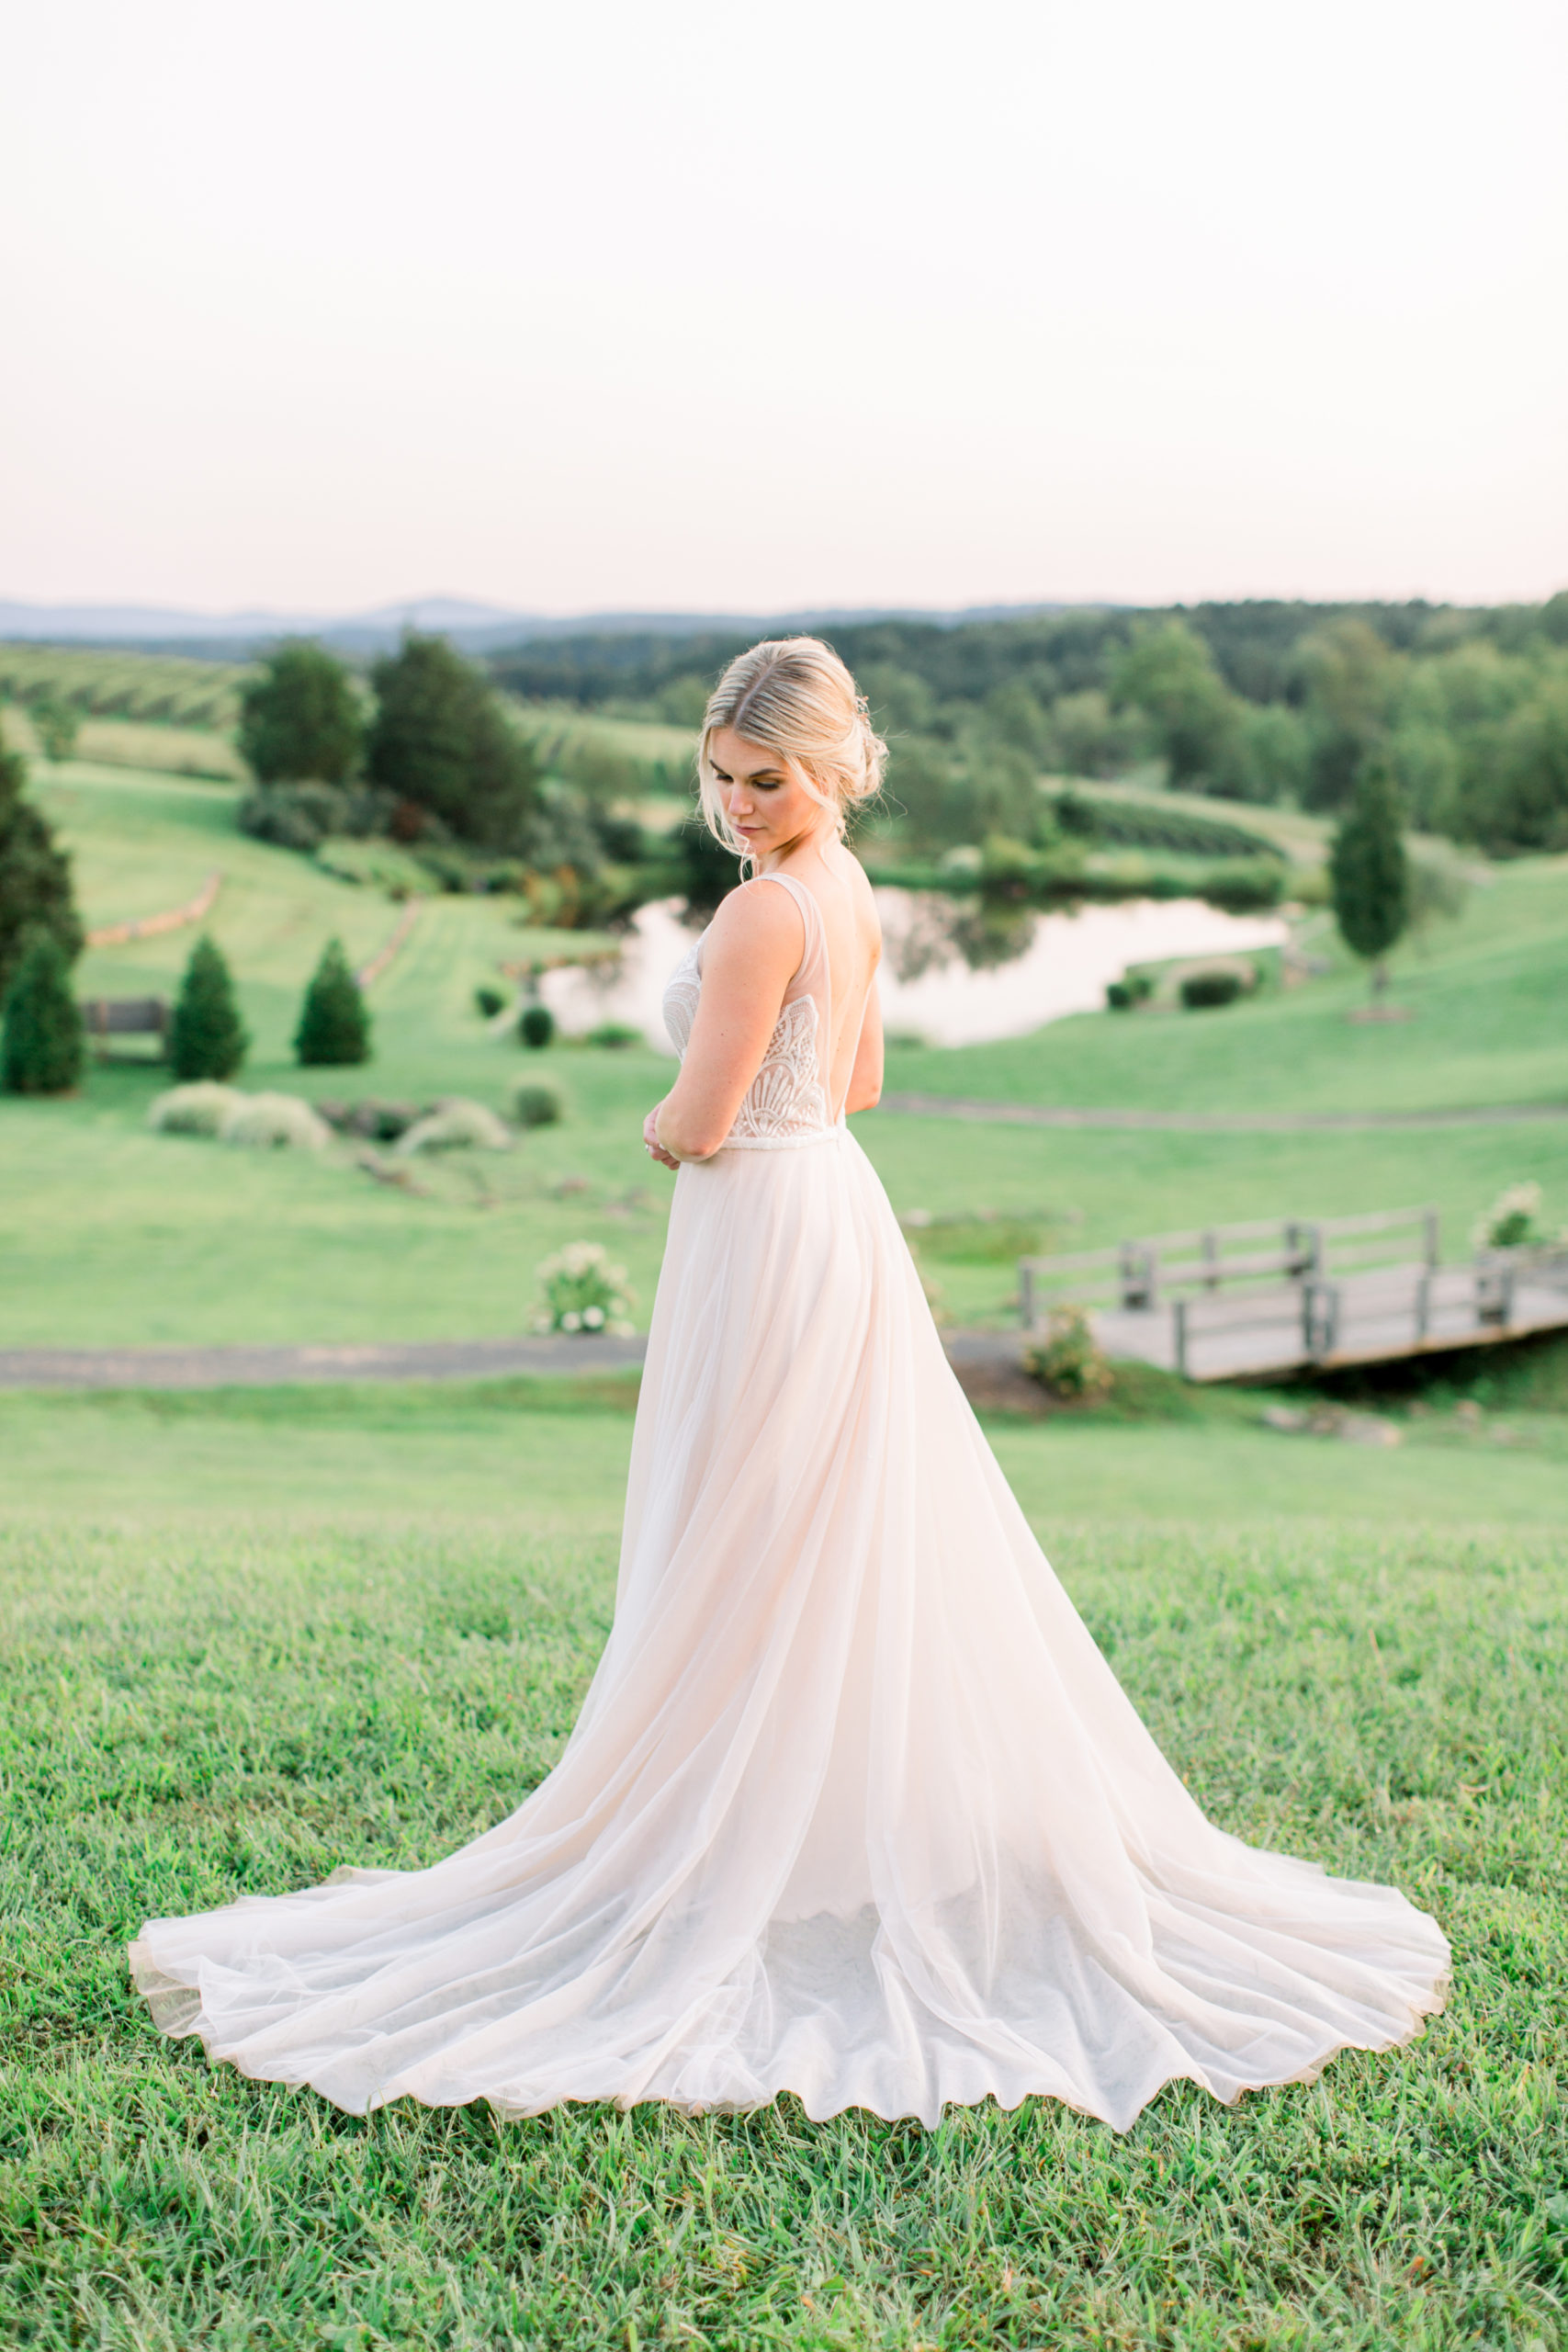 stone tower wedding, romantic wedding, dc florist, modern bride, classic wedding